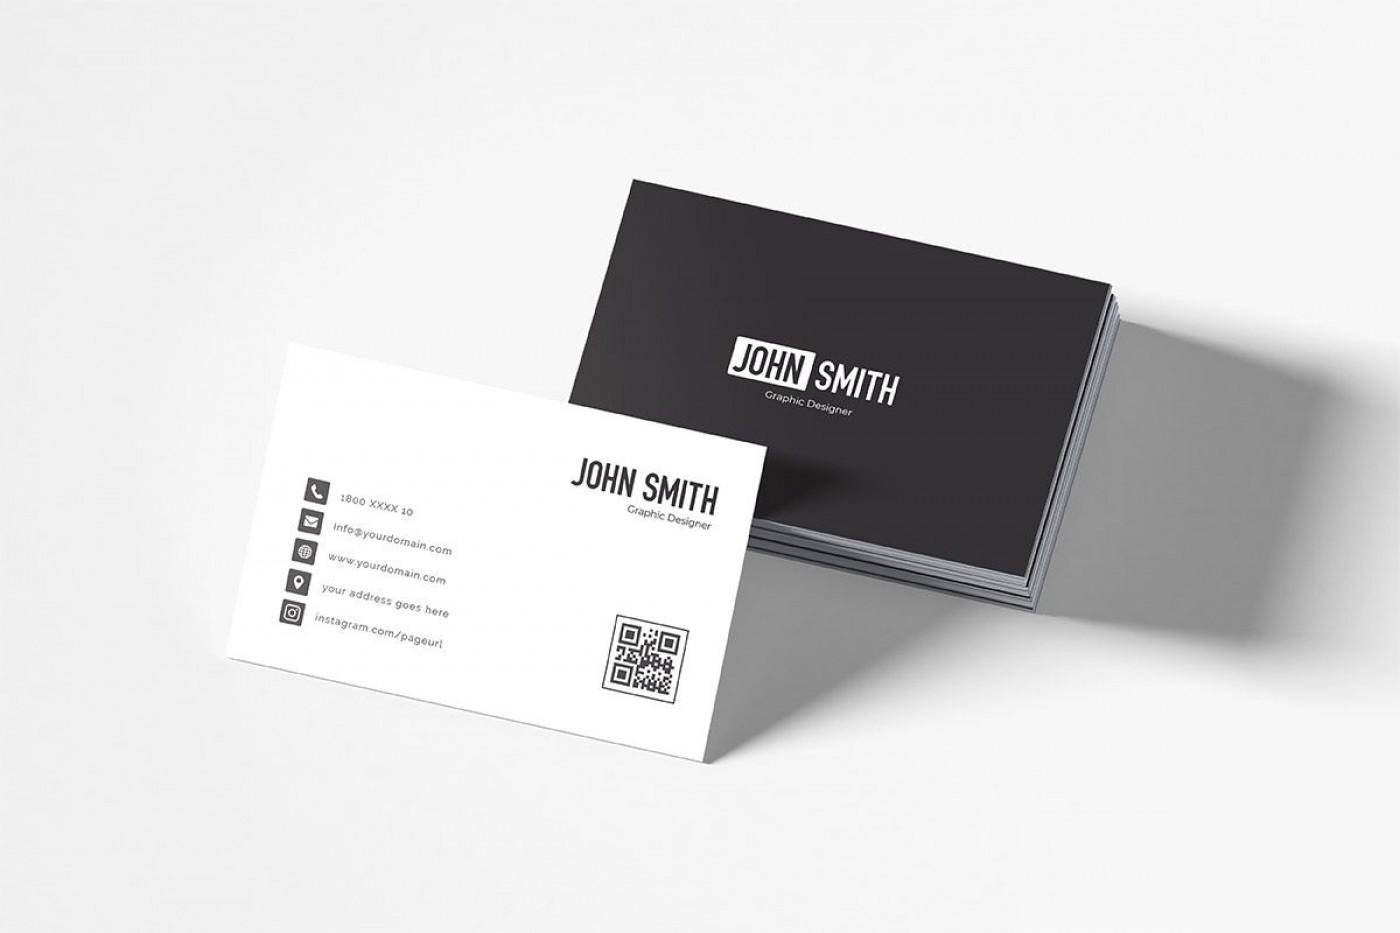 007 Impressive Simple Busines Card Template Free Highest Clarity  Minimalist Illustrator Design1400